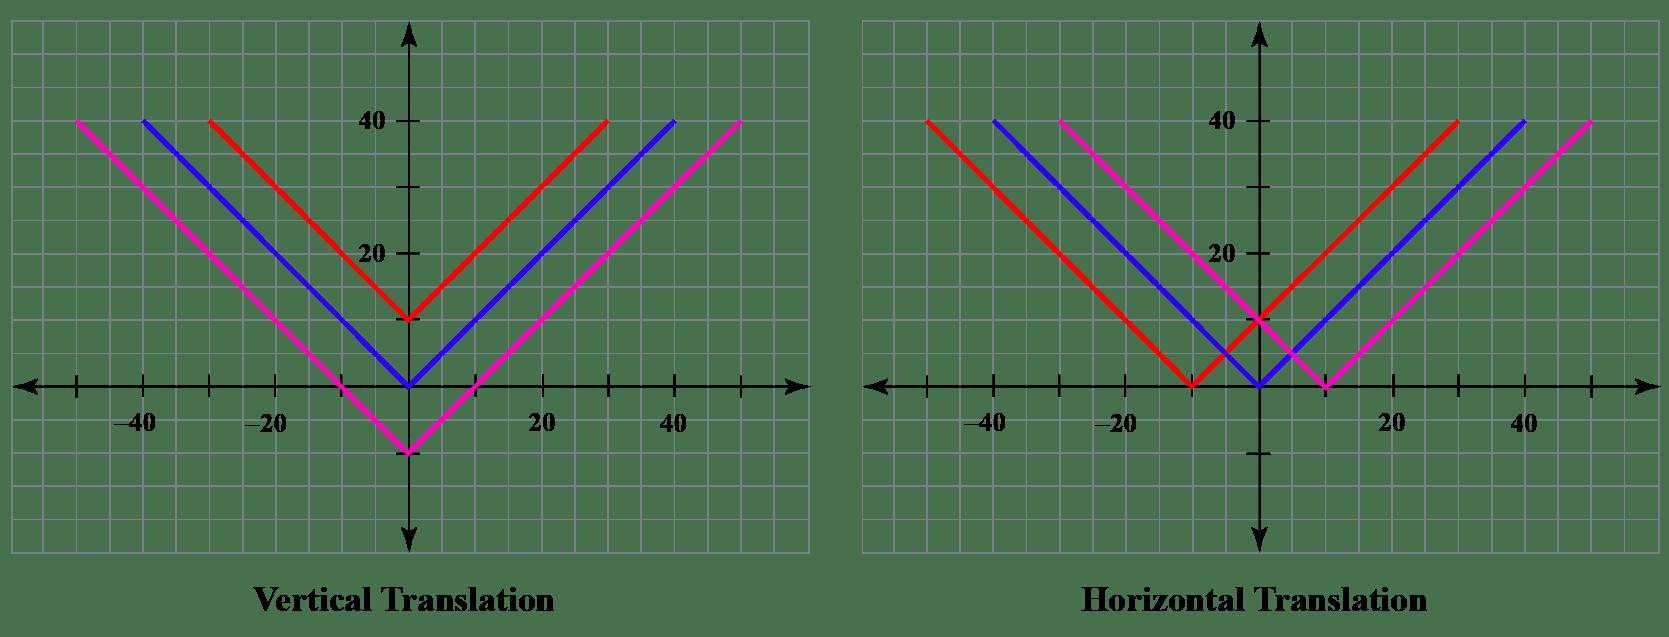 hight resolution of Horizontal translation  Concept